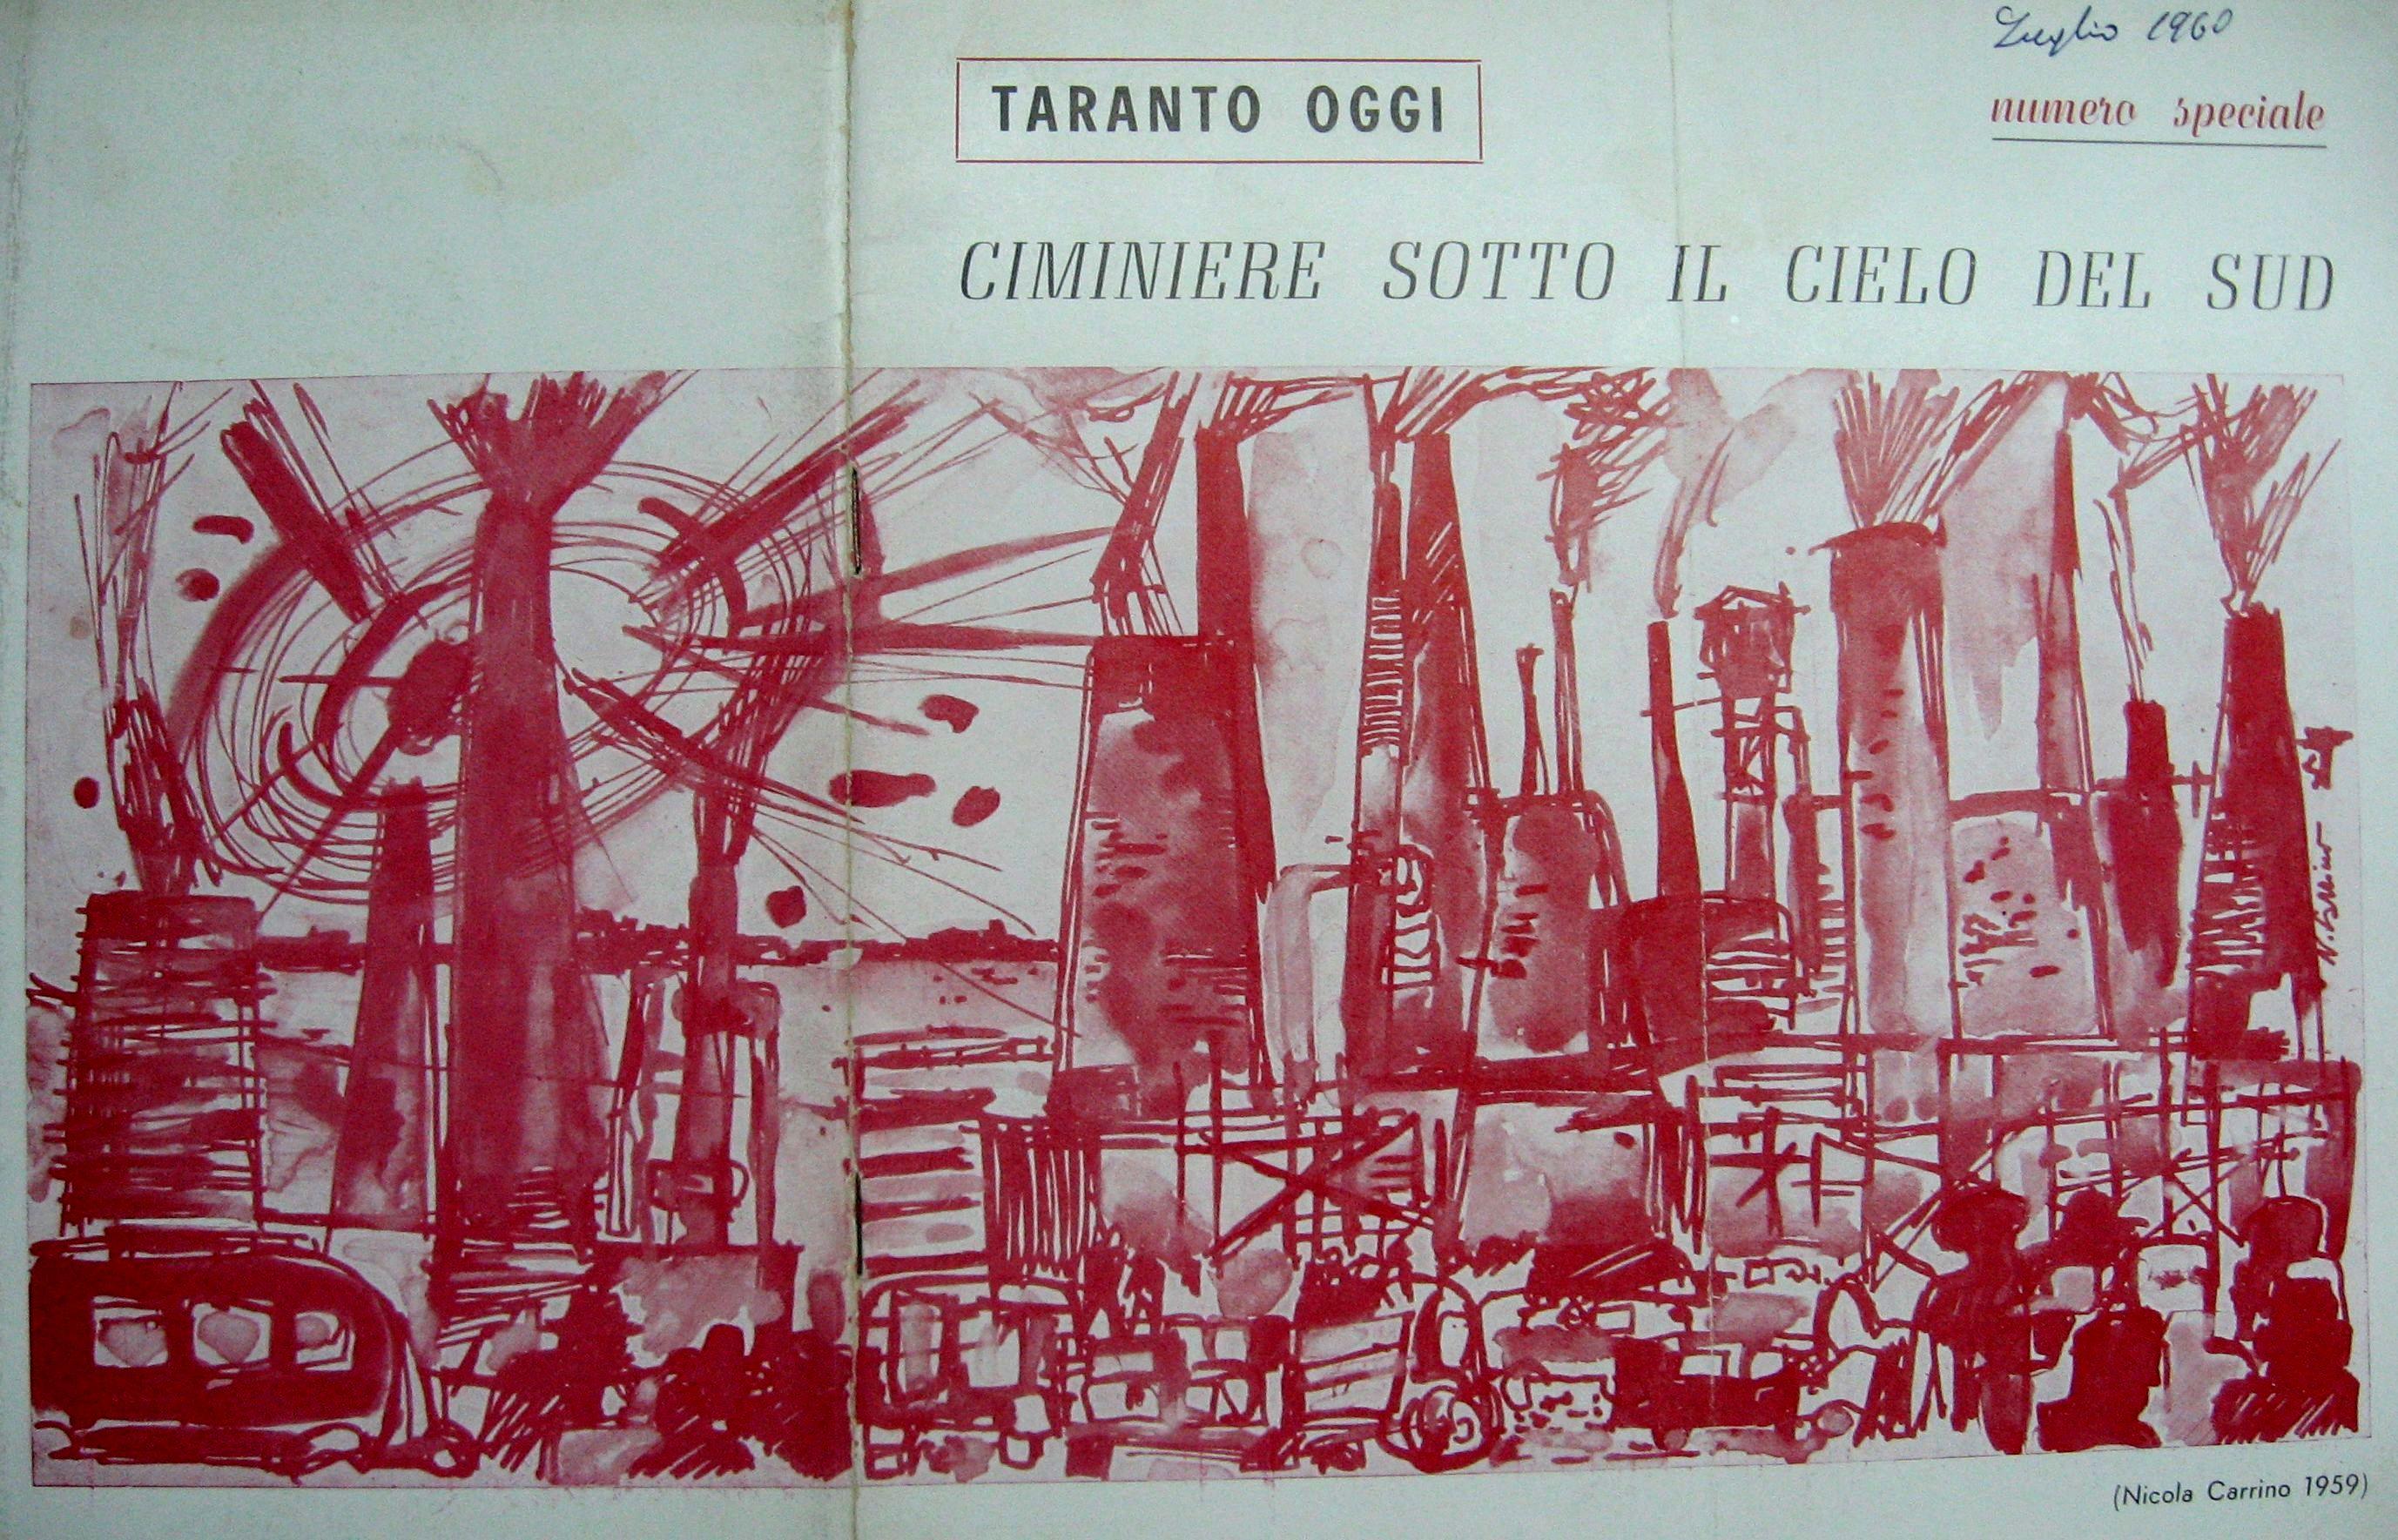 Copertina di Taranto Oggi a firma di Nicola Carrino